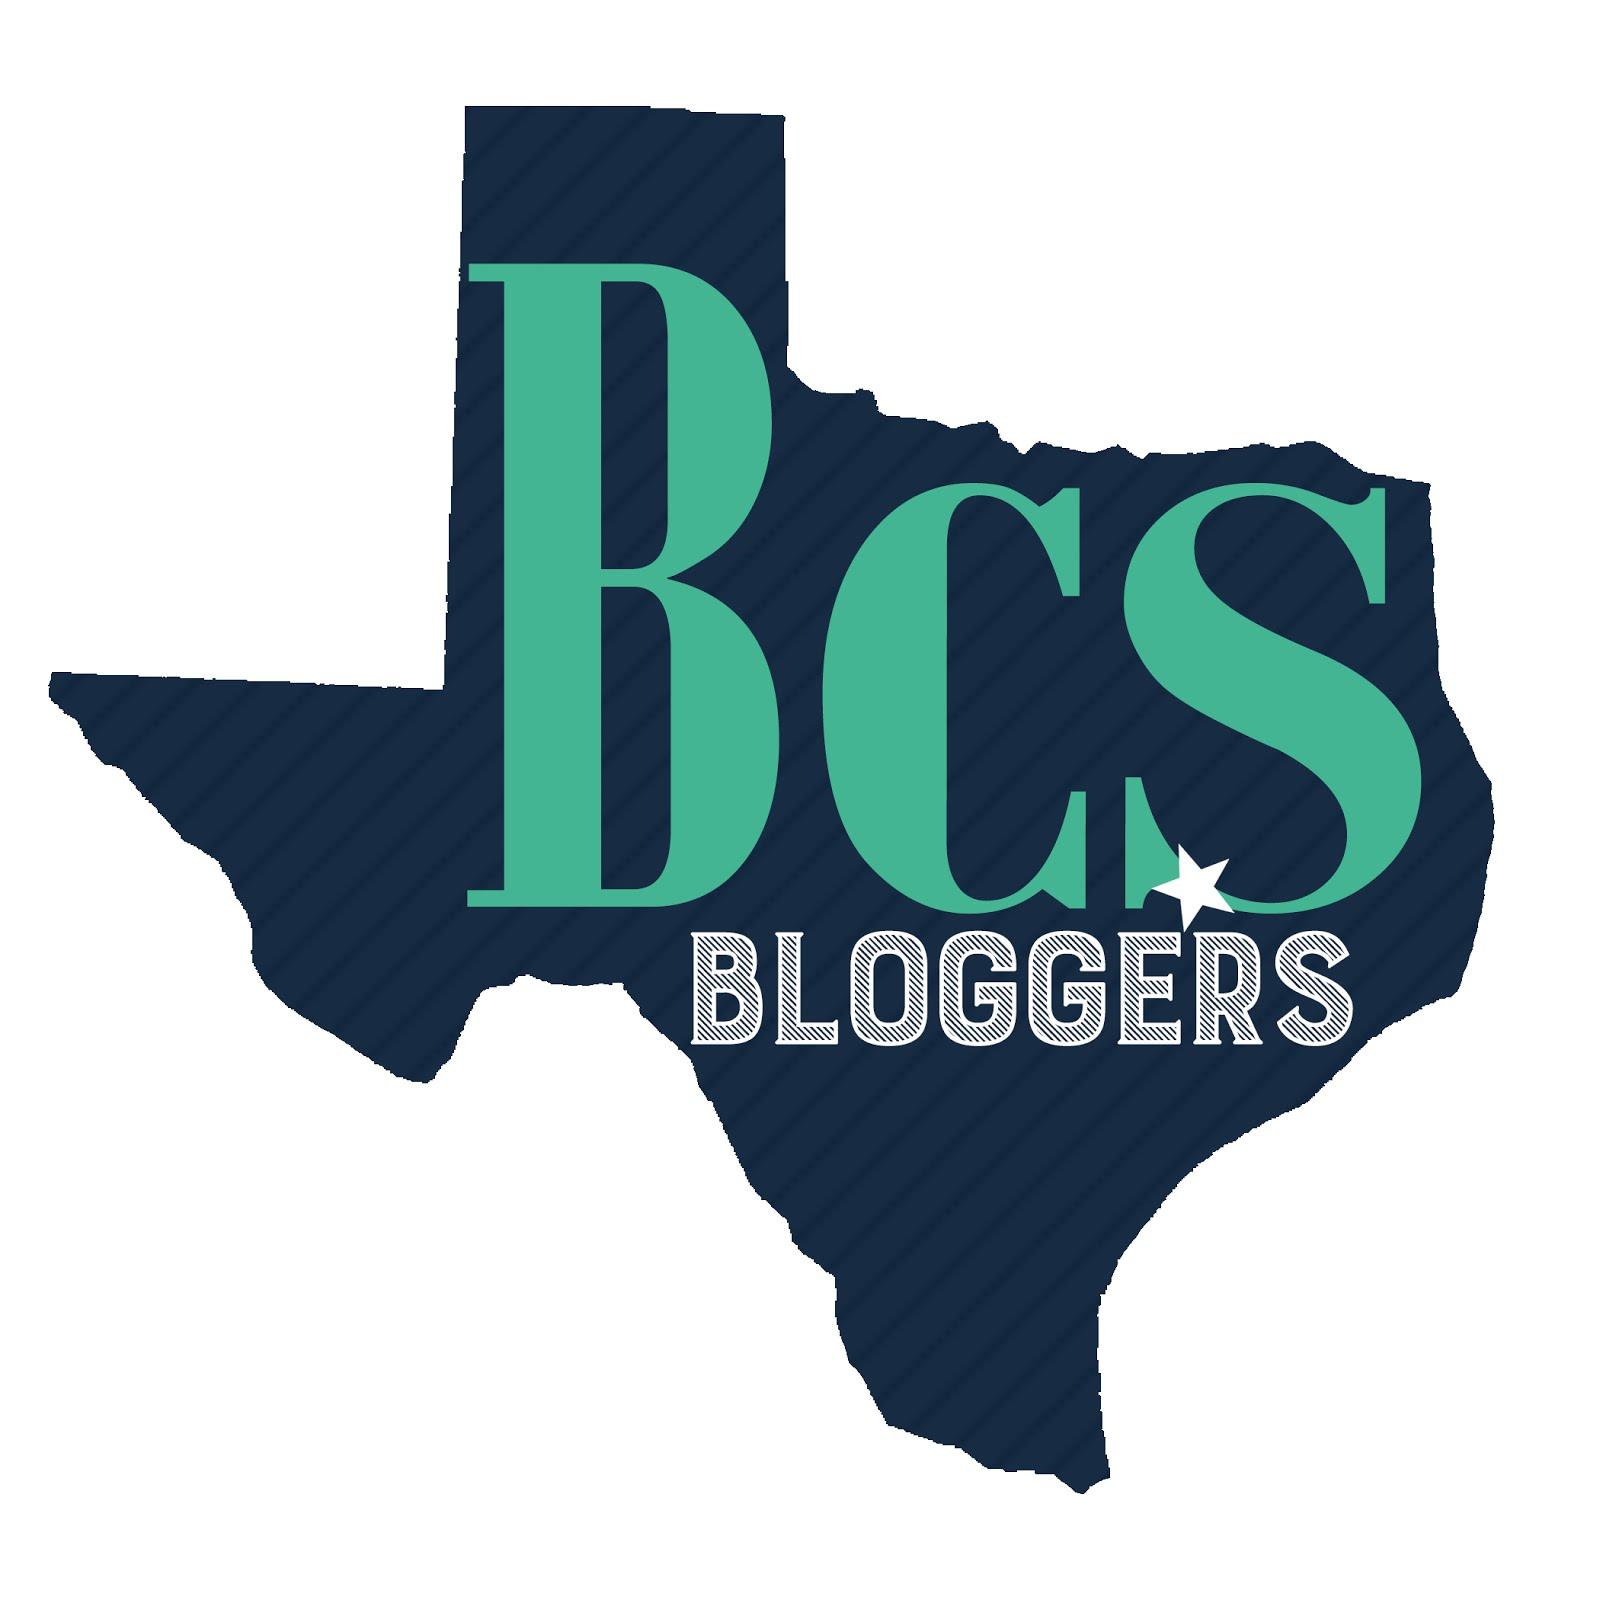 BCS Bloggers